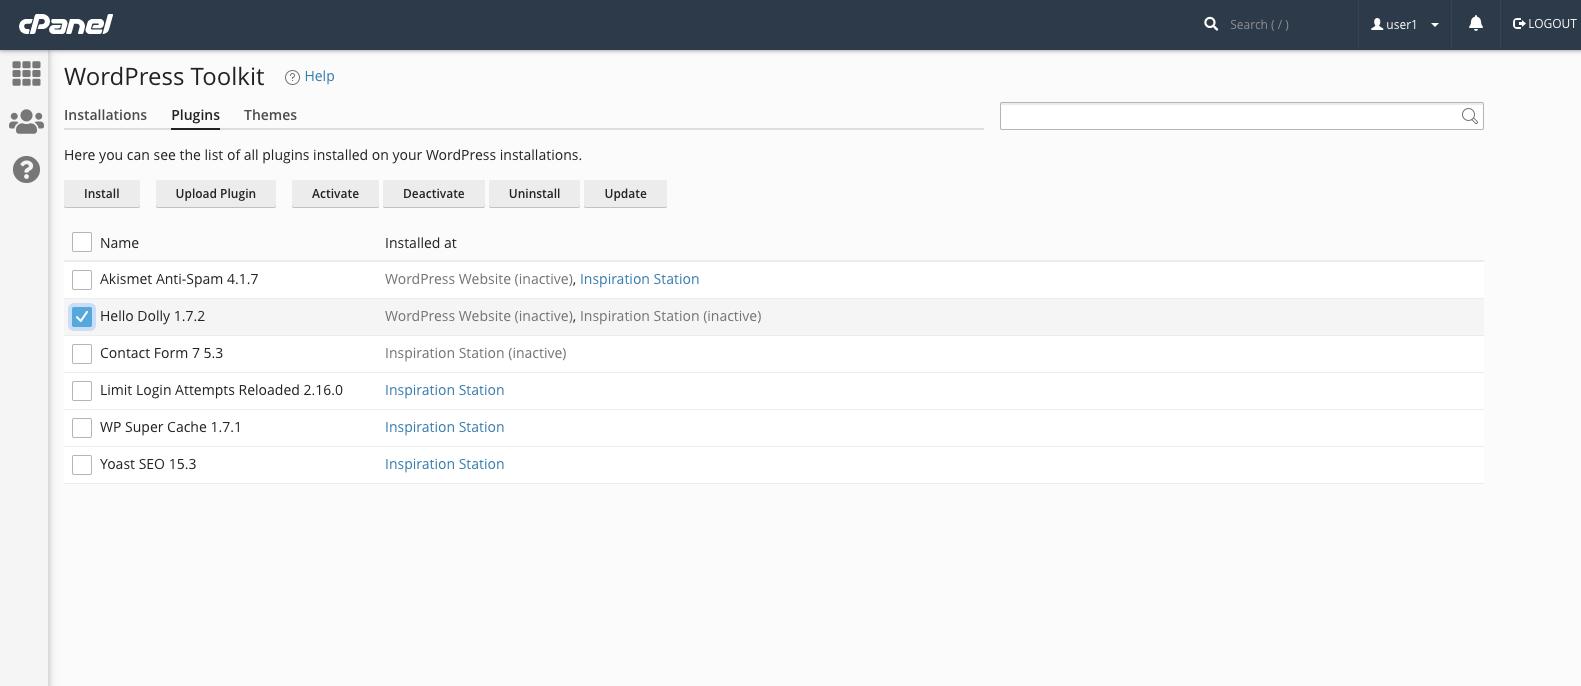 WordPress Toolkit for cPanel Bulk Uninstall Plugins